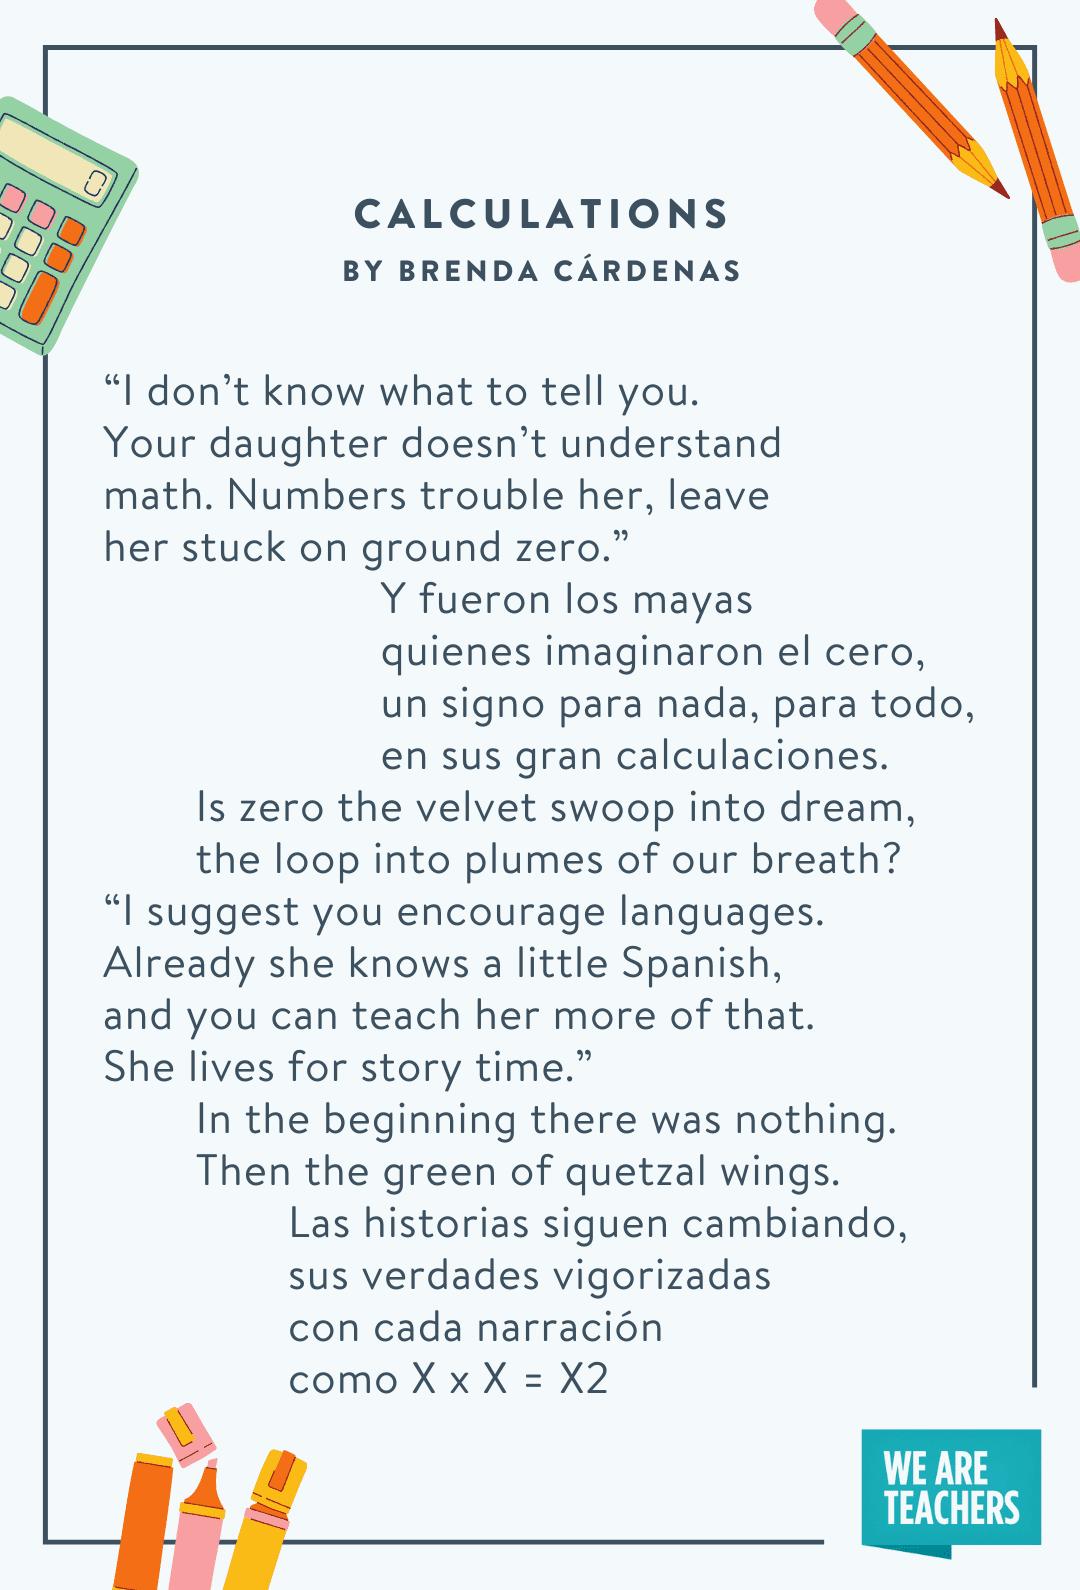 Calculations by Brenda Cárdenas -- back to school poems